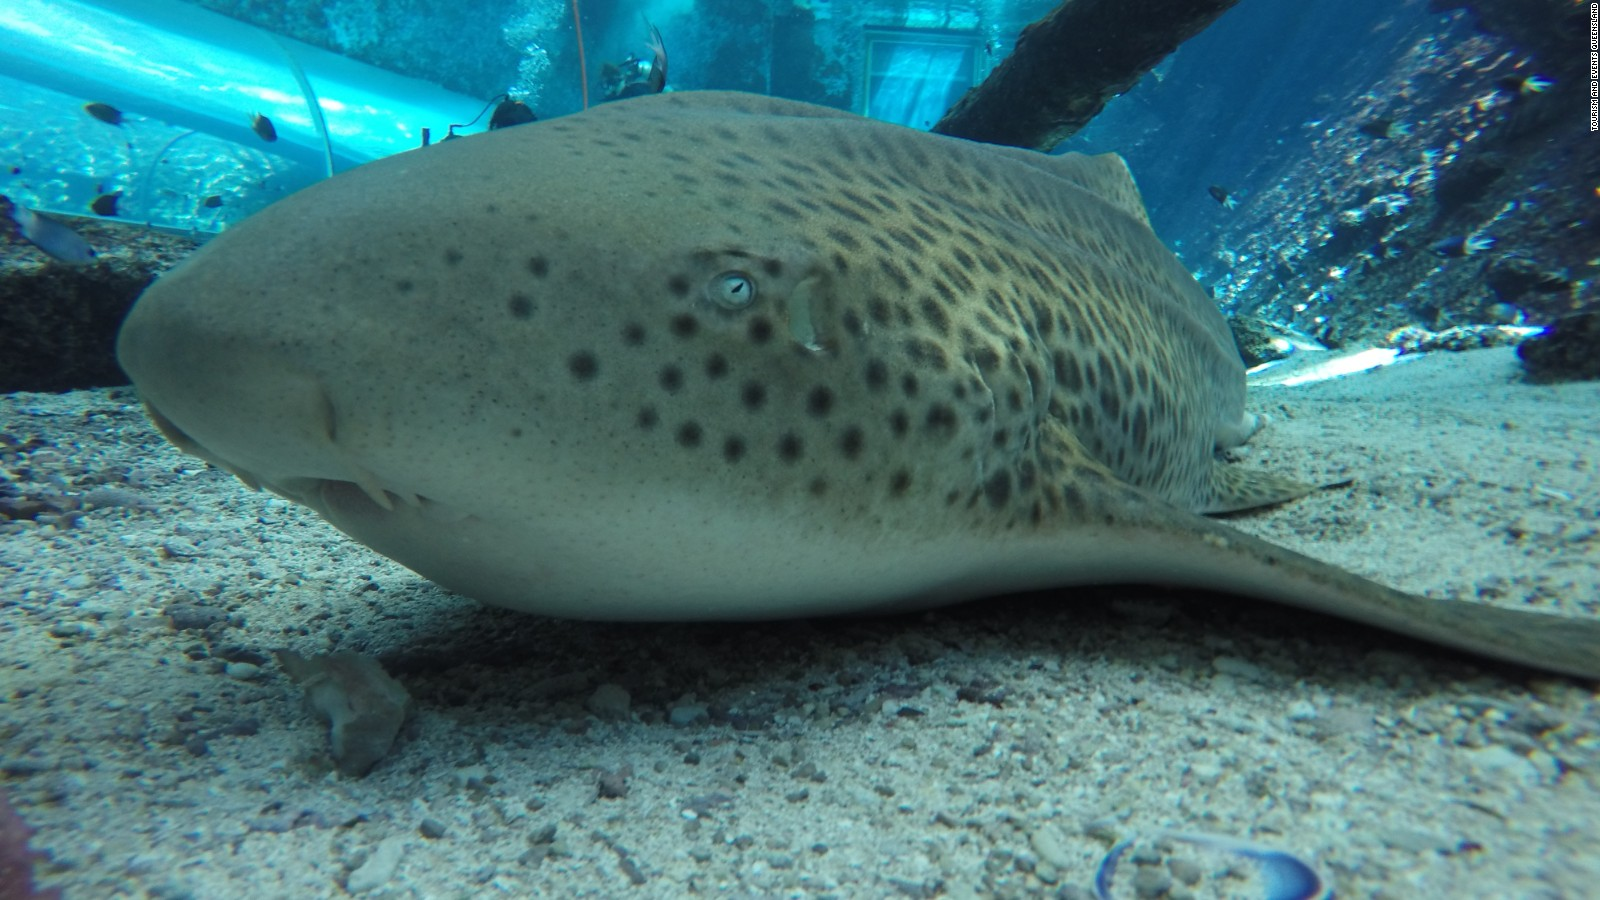 Shark in captivity gives 'virgin birth'